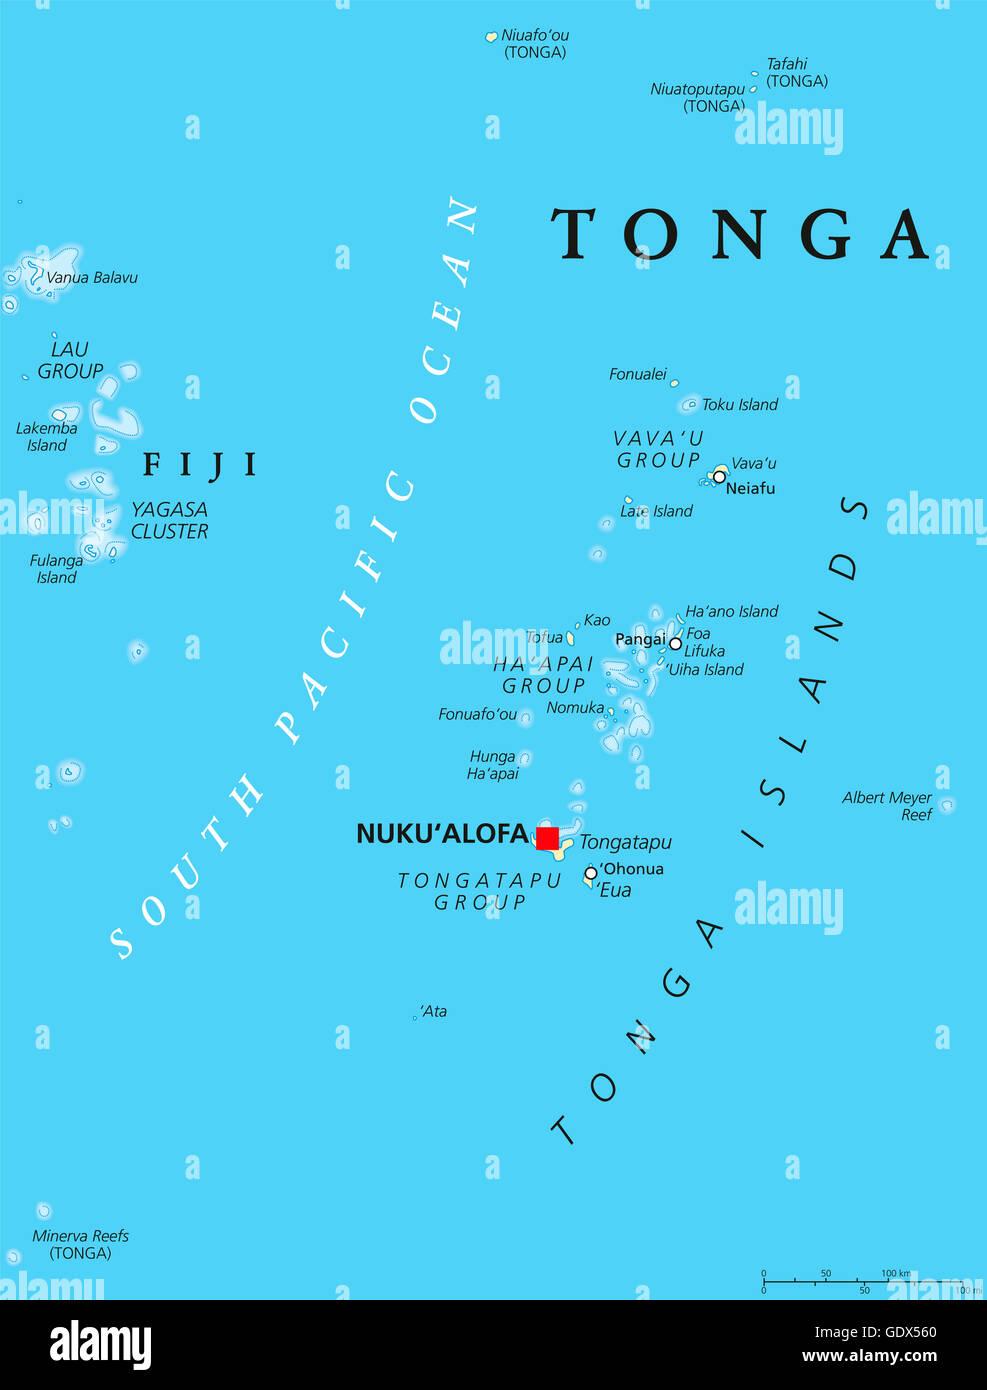 Tonga political map with capital Nukualofa. Kingdom, sovereign state on kingdom of mali map, republic of kiribati map, kingdom of dahomey map, tongatapu map, turtledove atlantis map, tonga on map, australia map, new zealand map, bourbon chase map, kingdom of benin map, tonga world map, kingdom of bhutan map, tonga country map, united kingdom map, tonga trench map, saudi arabia map, tonga volcano map, papua new guinea map, vava'u tonga map, bangladesh map,